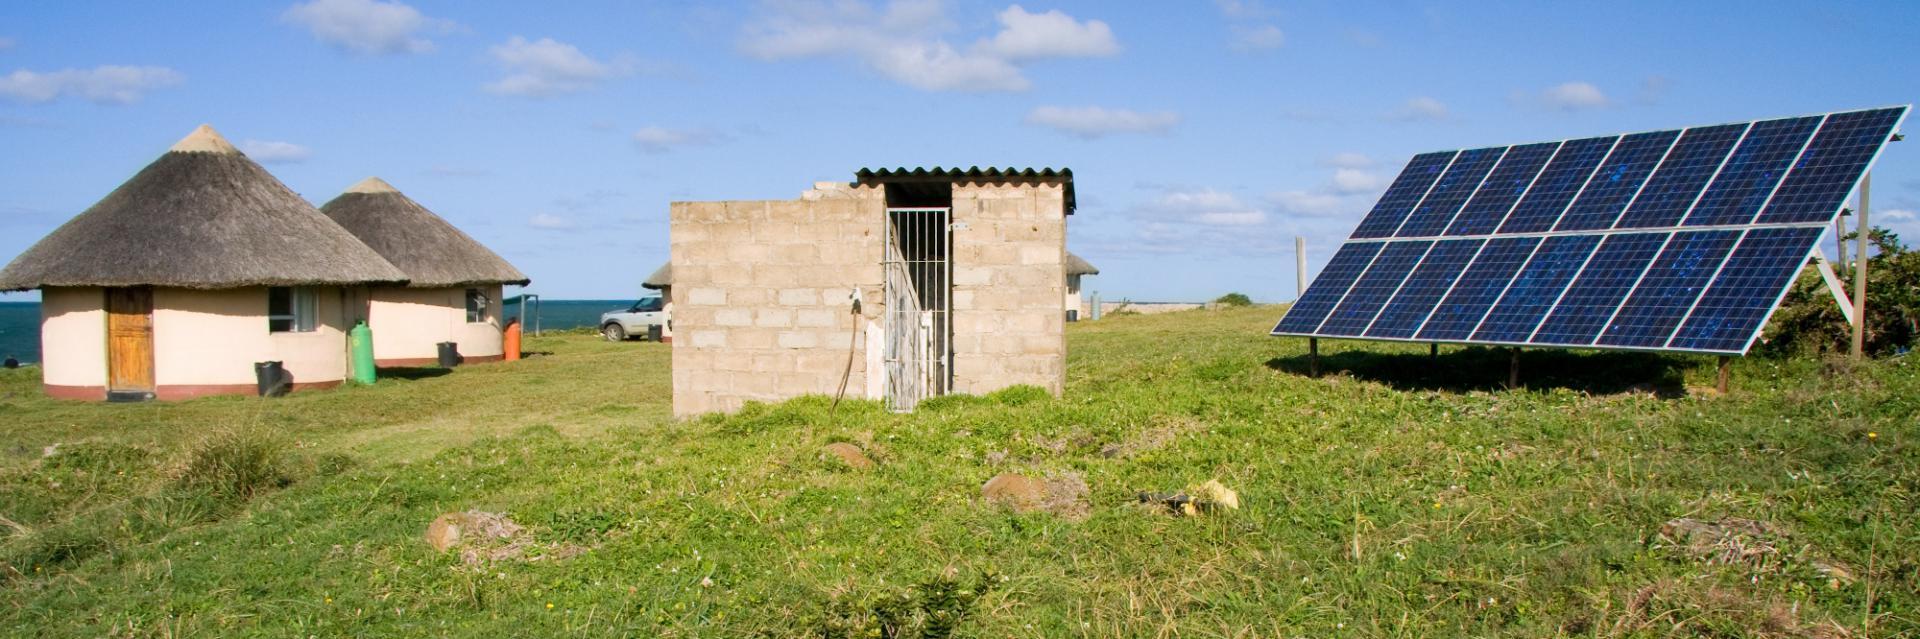 How AfCFTA can help solar power penetration in Africa